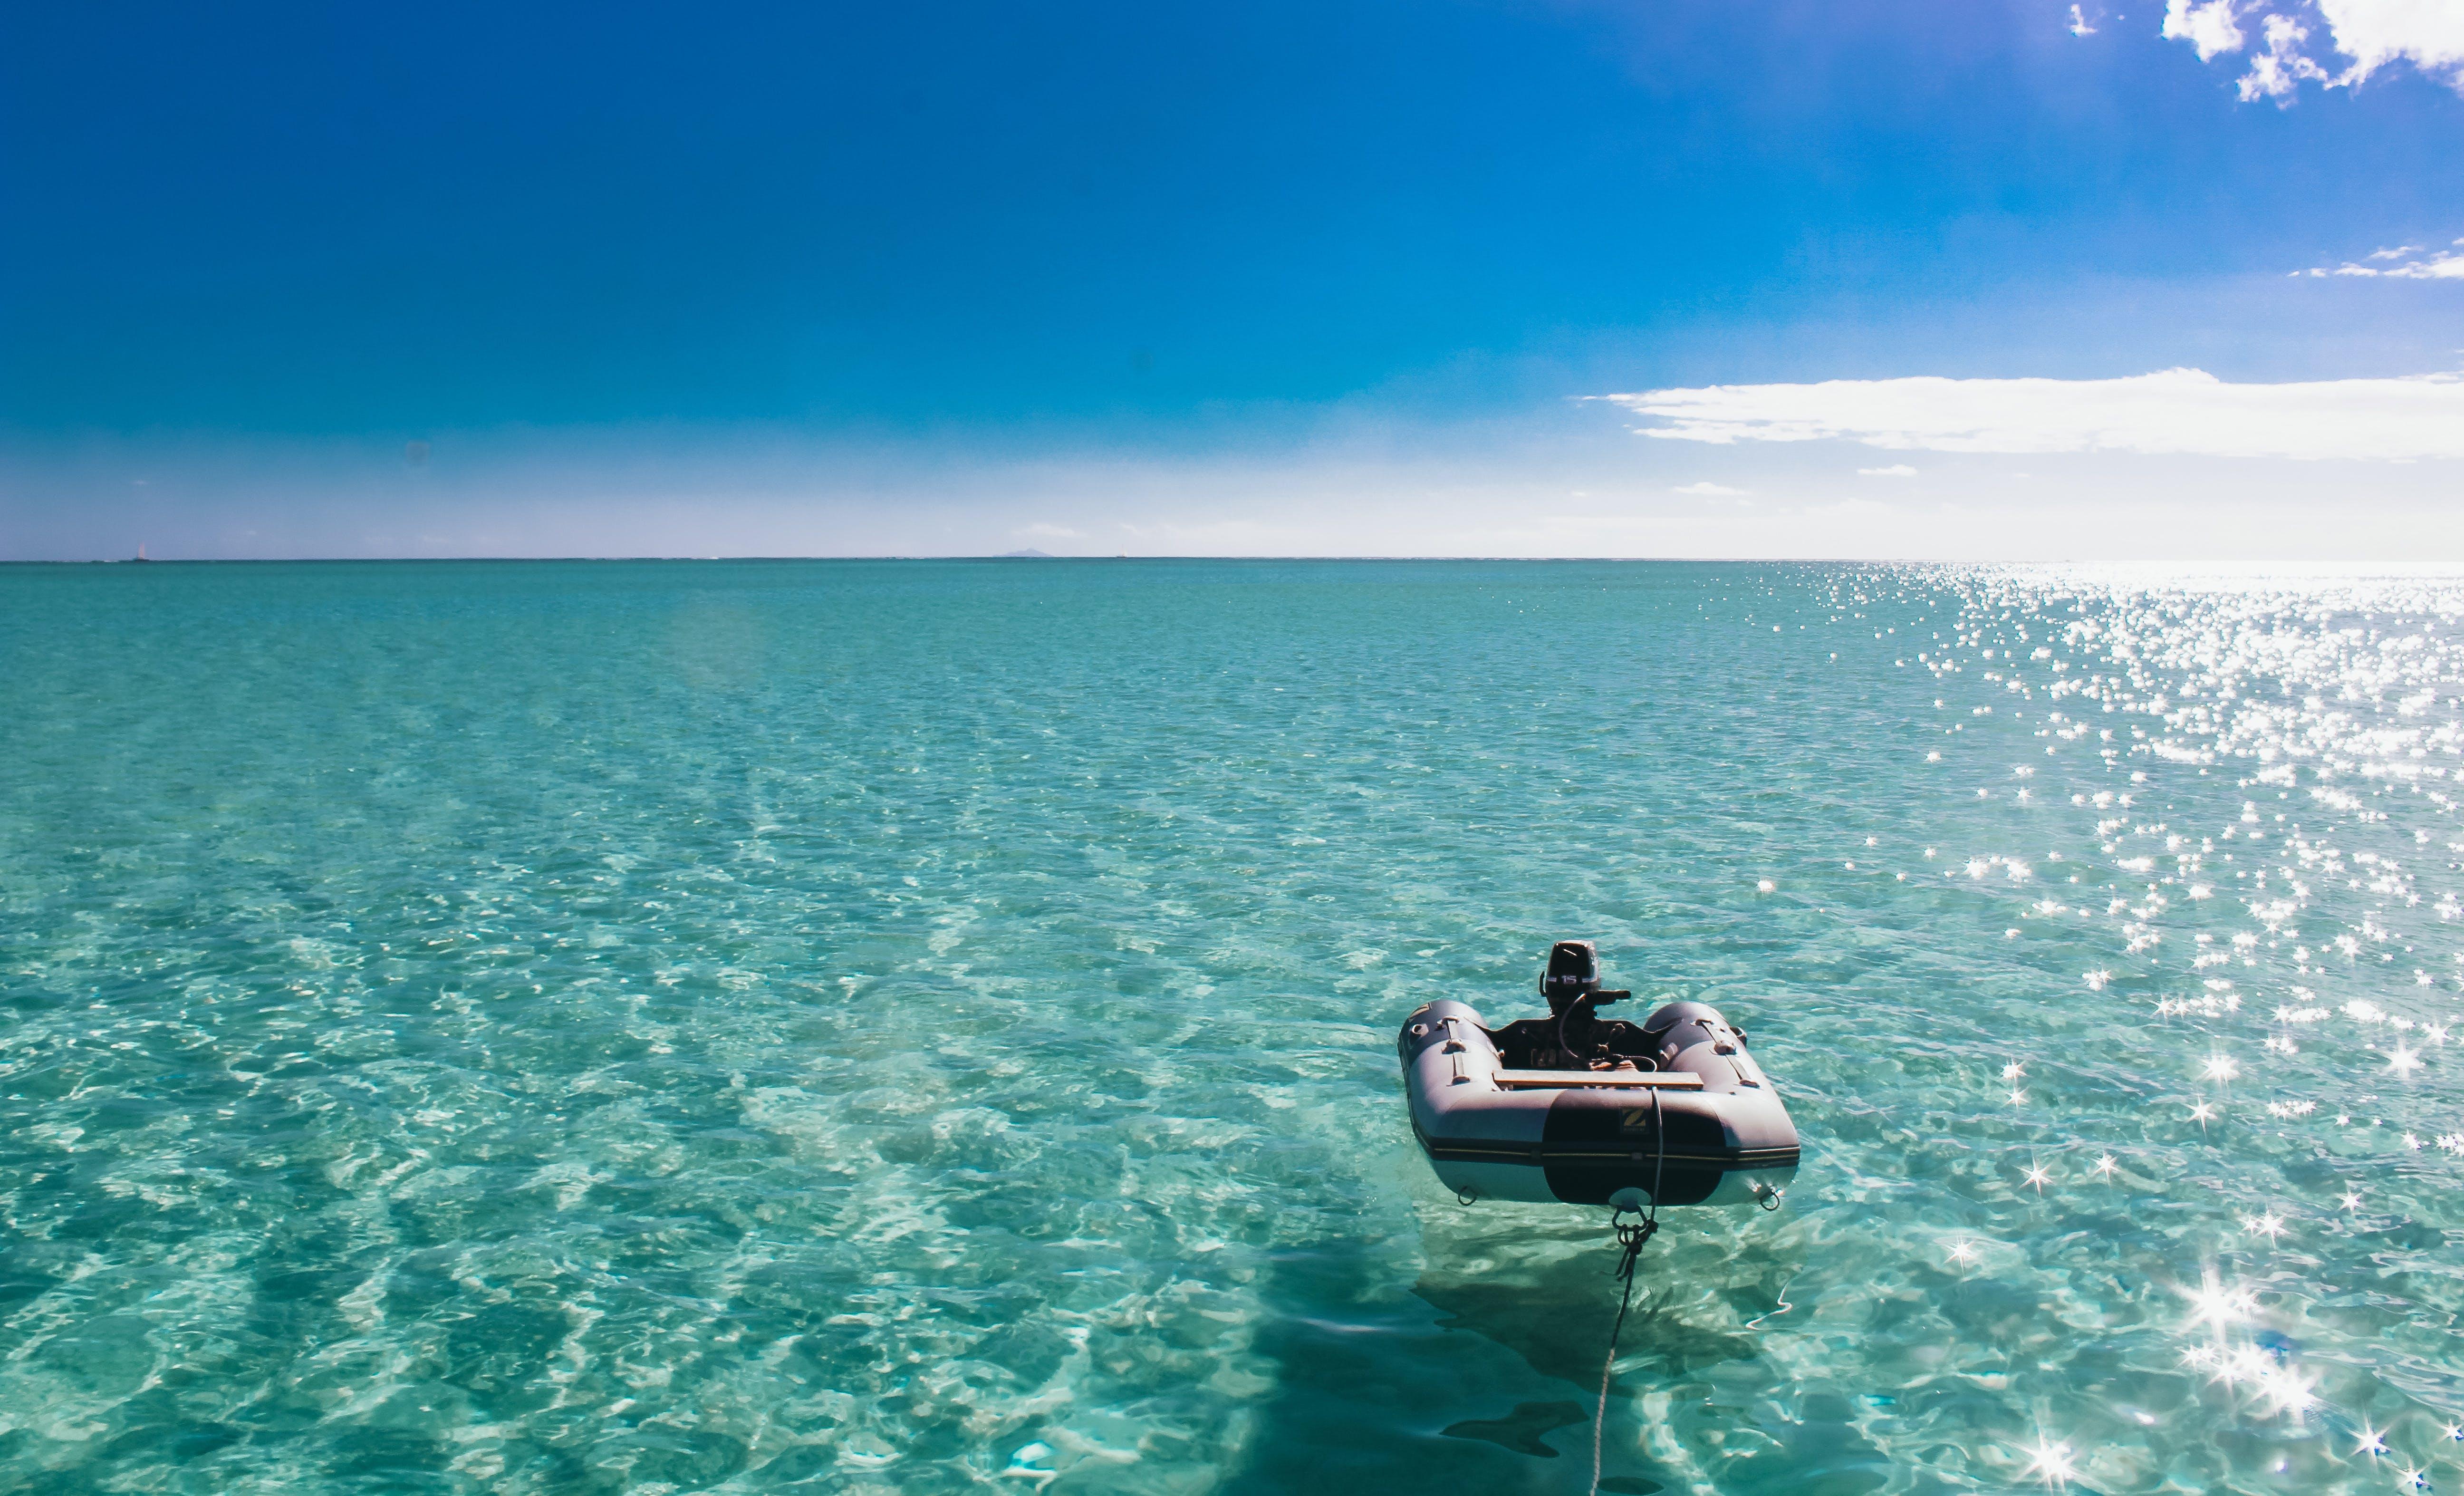 blaue lagune, blauer himmel, boot